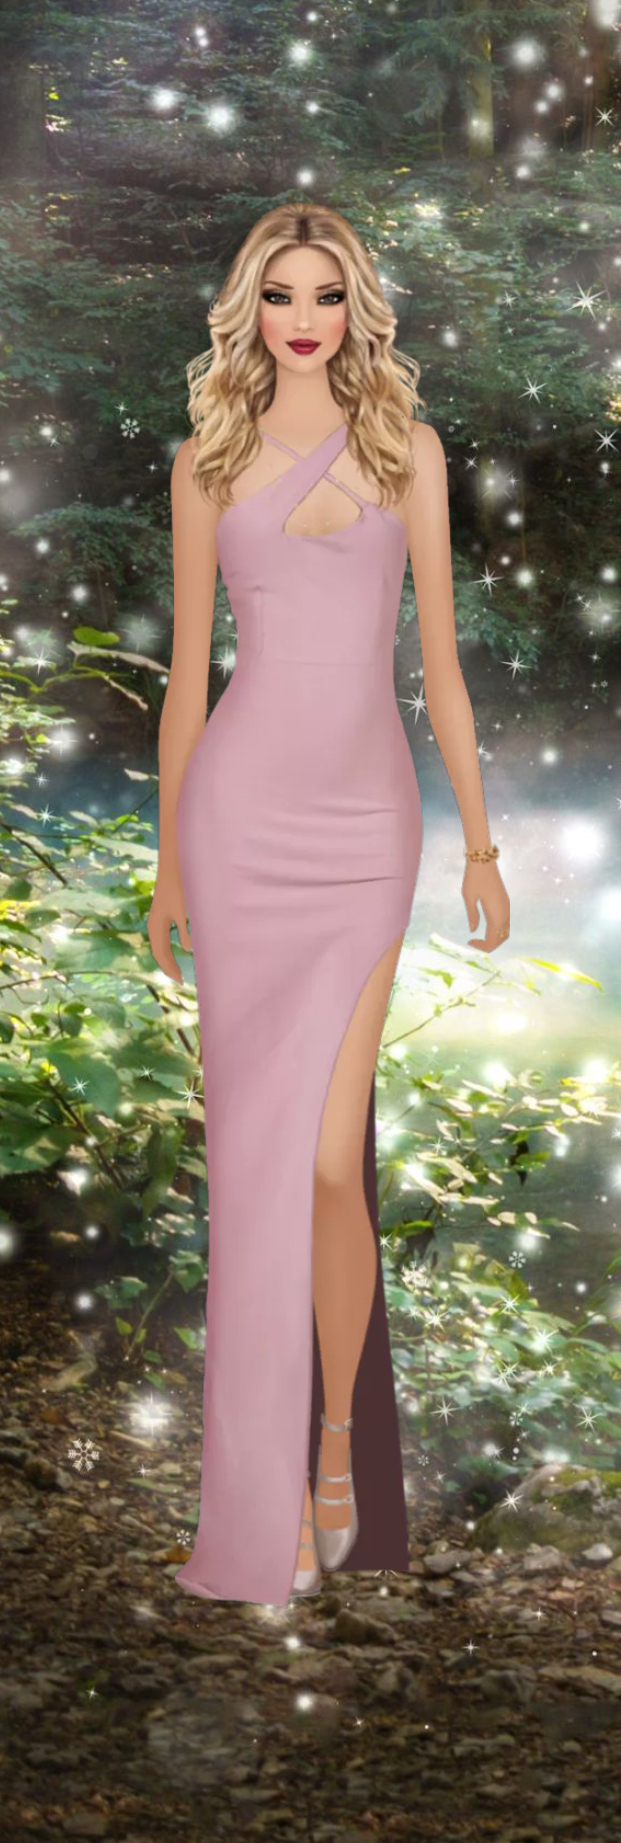 Fairy Lake | Vestidos | Pinterest | Covet fashion, Trajes de fiesta ...